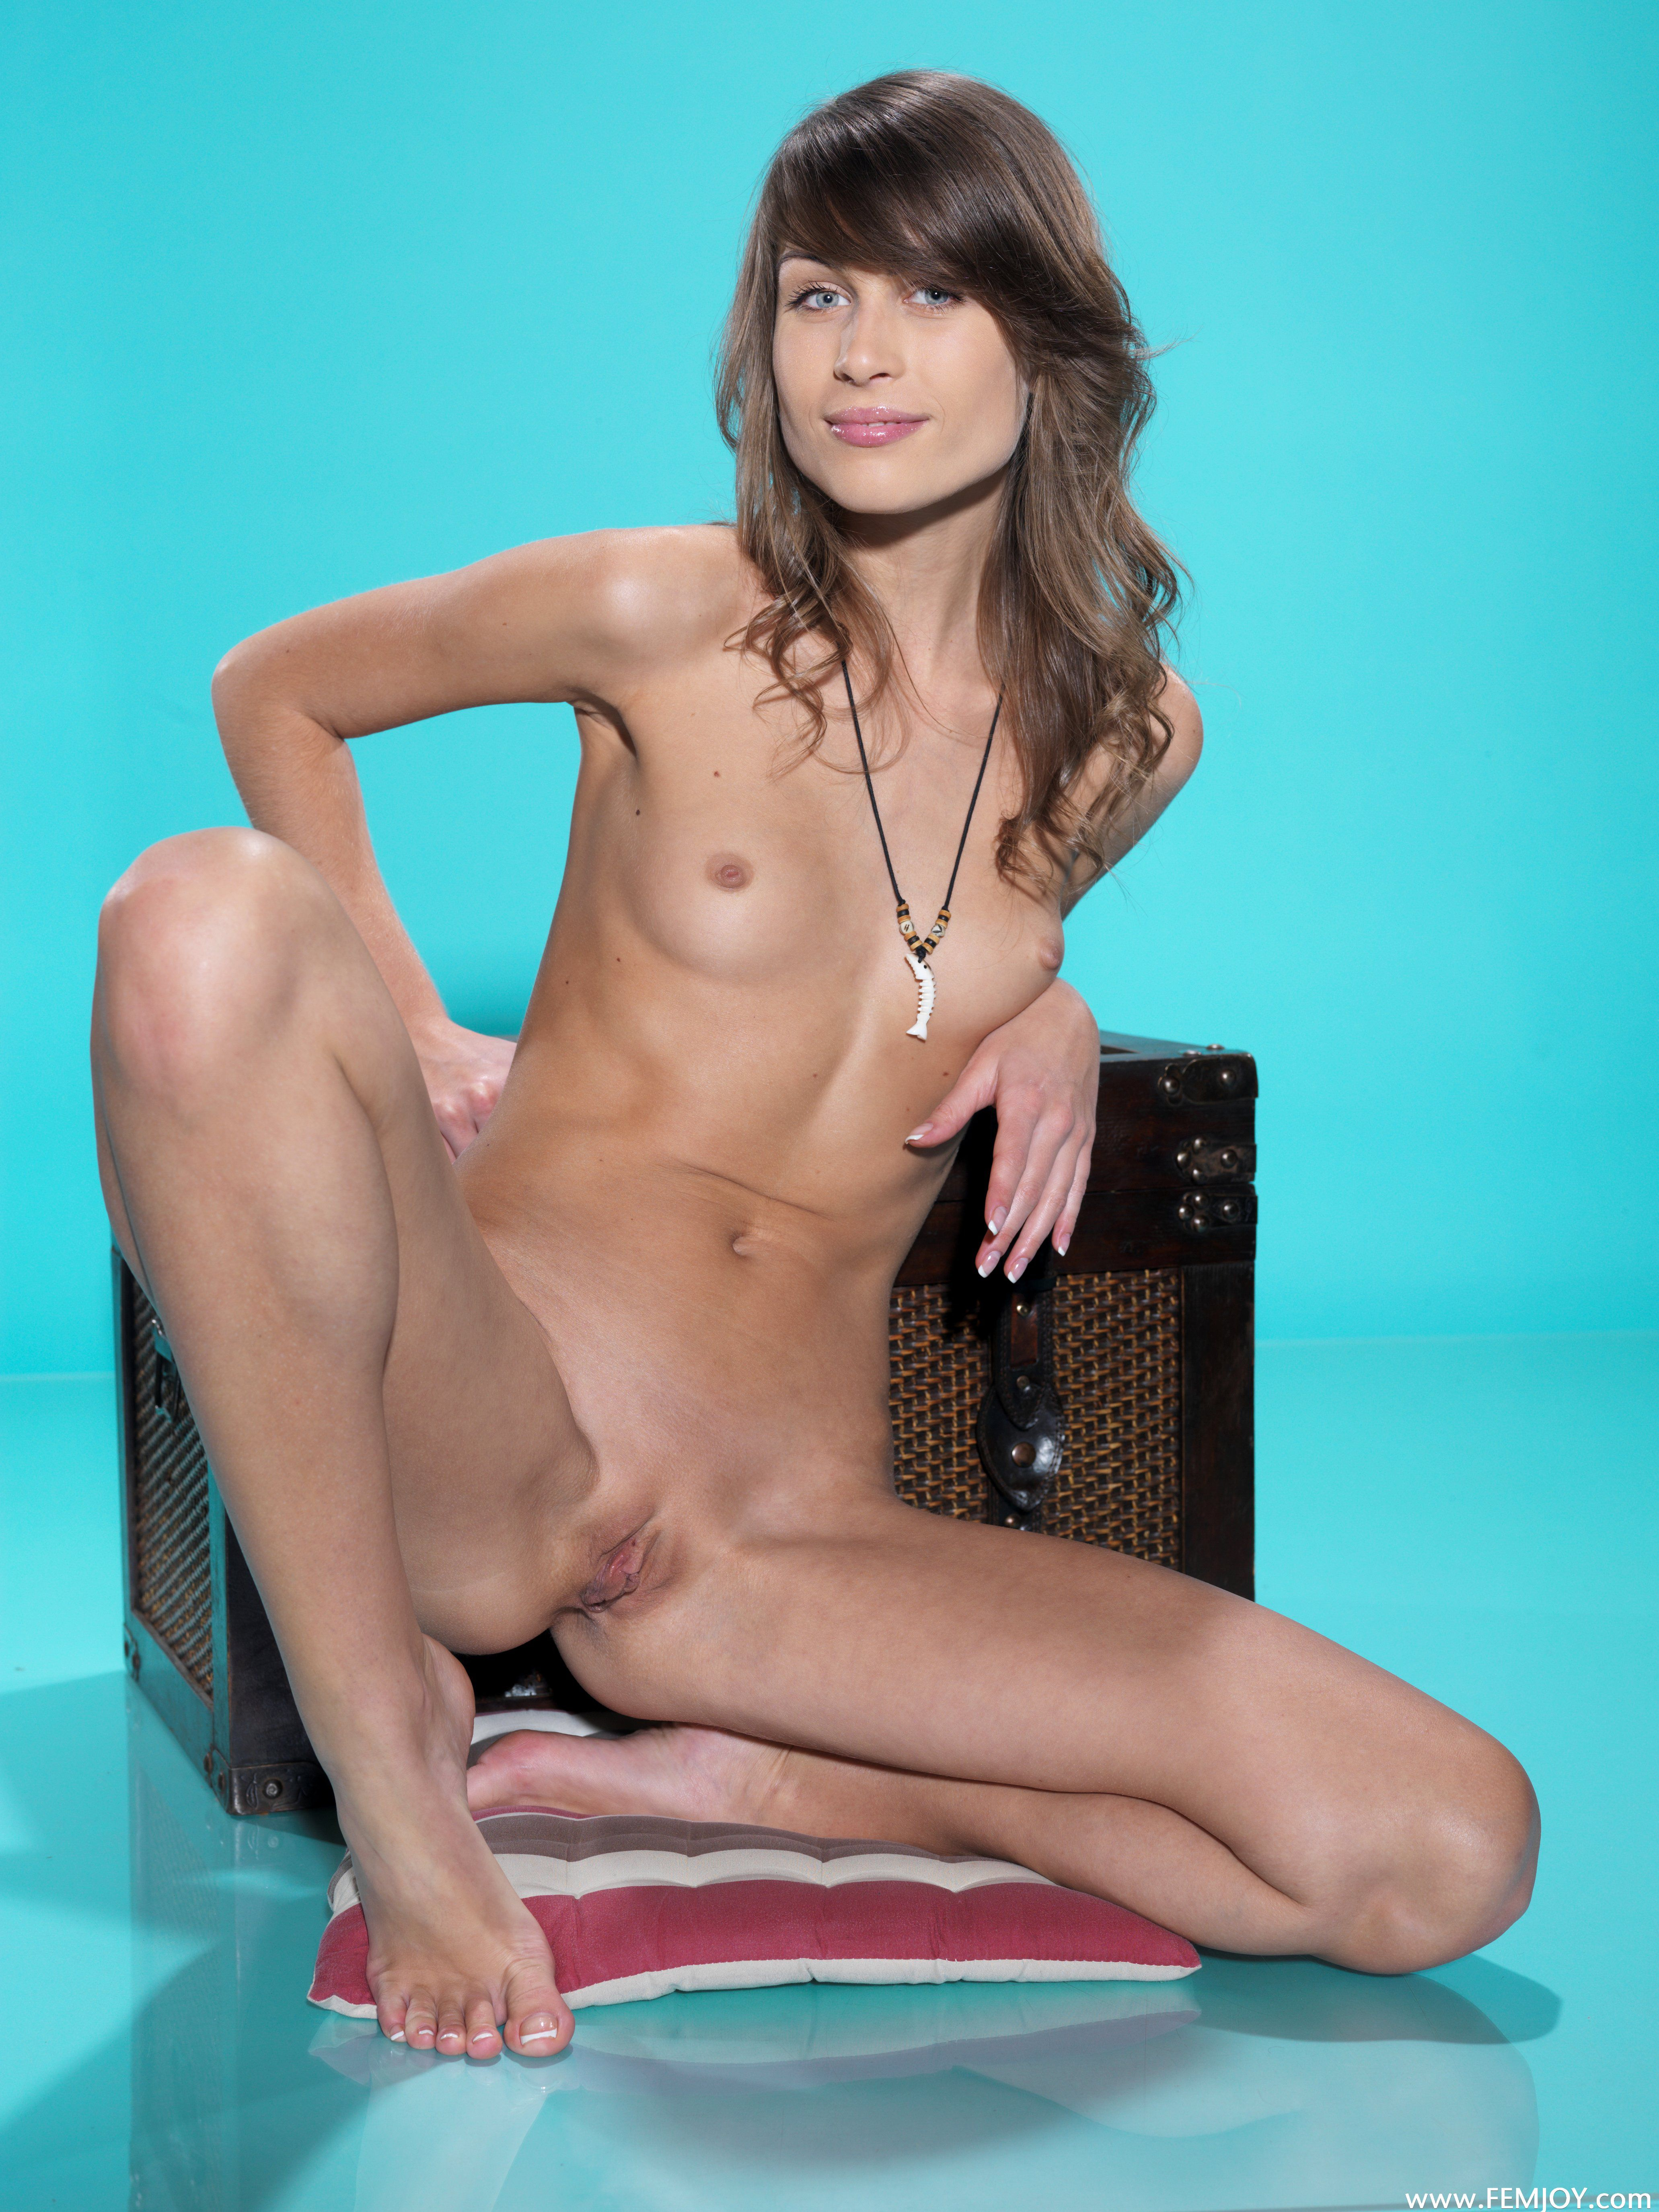 http://i3.imageban.ru/out/2013/11/13/112fa8256cc61b04c05f84bd20d983f4.jpg